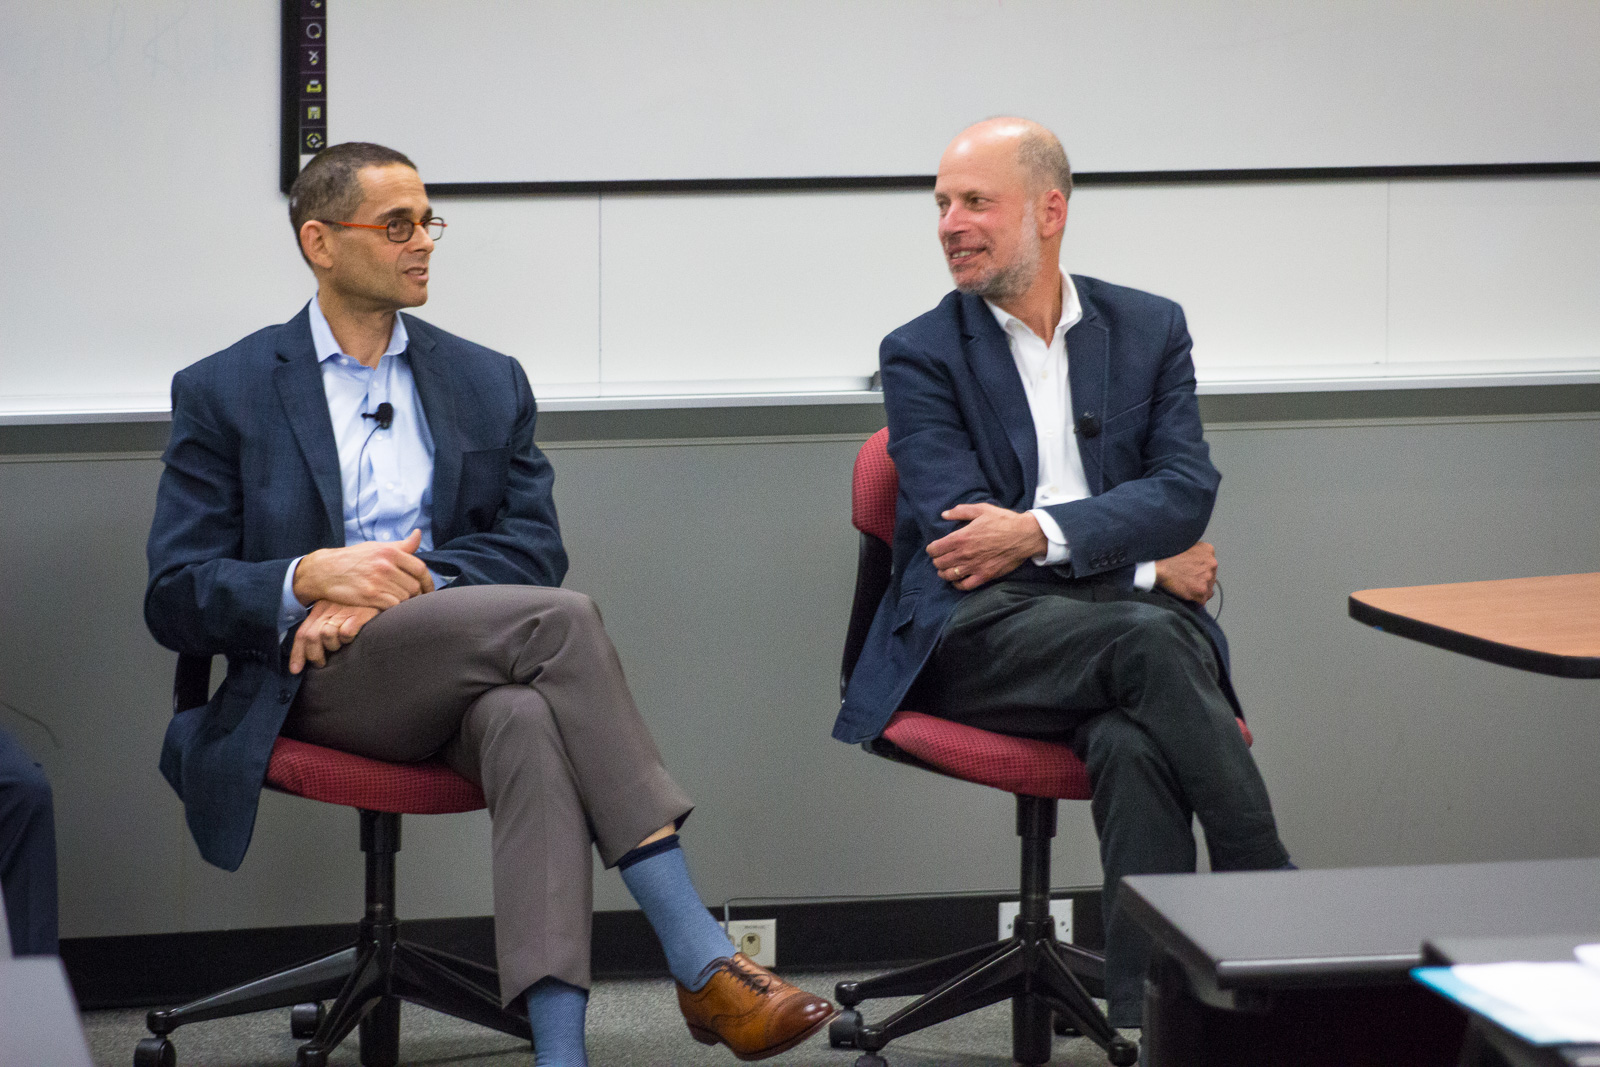 Professor Mark Rosen and Dean Krent at Constitution Day panel